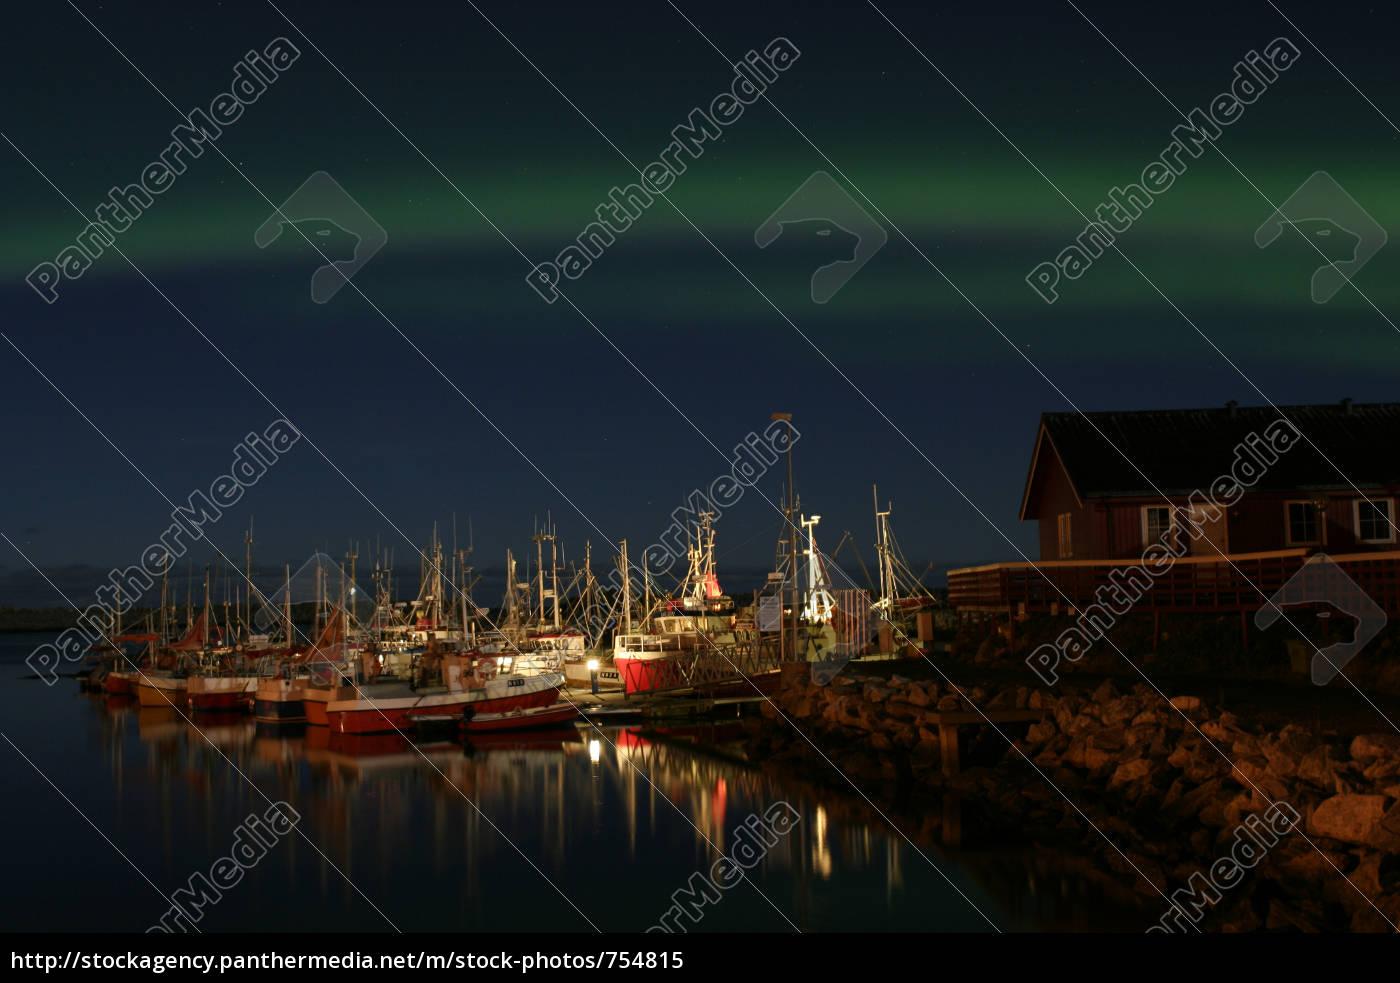 polar, light, at, the, harbor, in - 754815